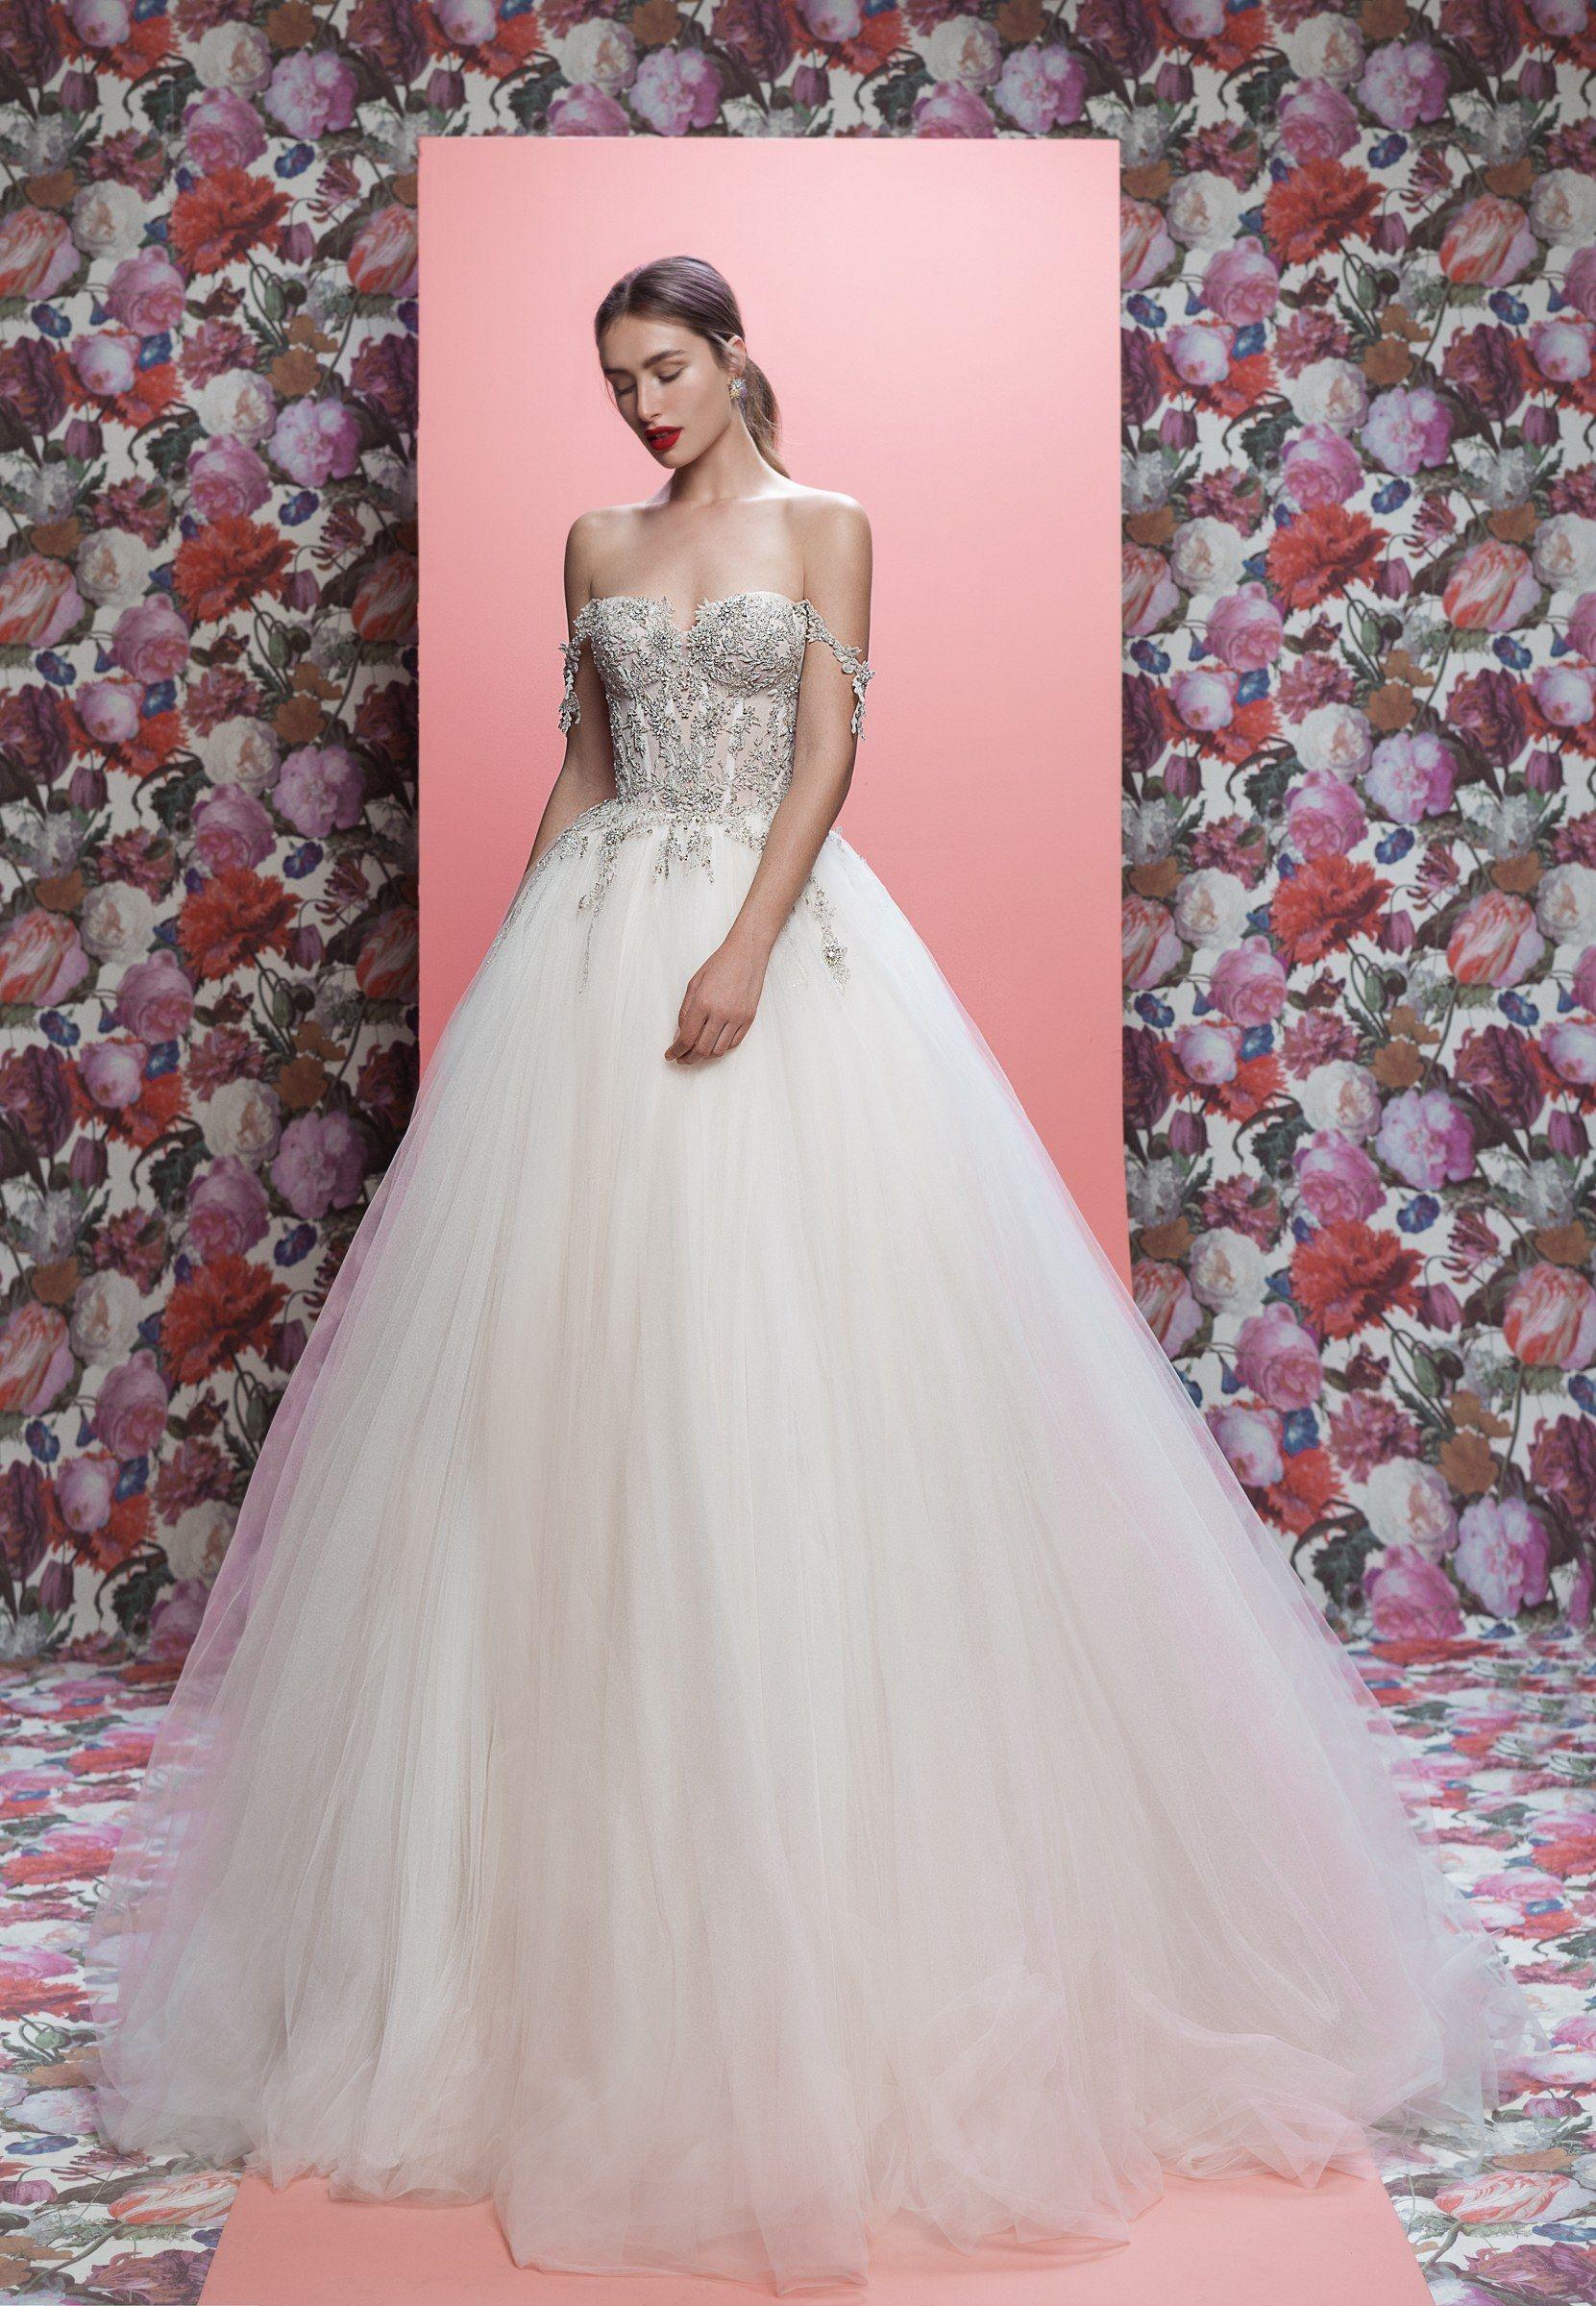 Galia Lahav Couture Spring 2019 Wedding Dress Collection – Part 2